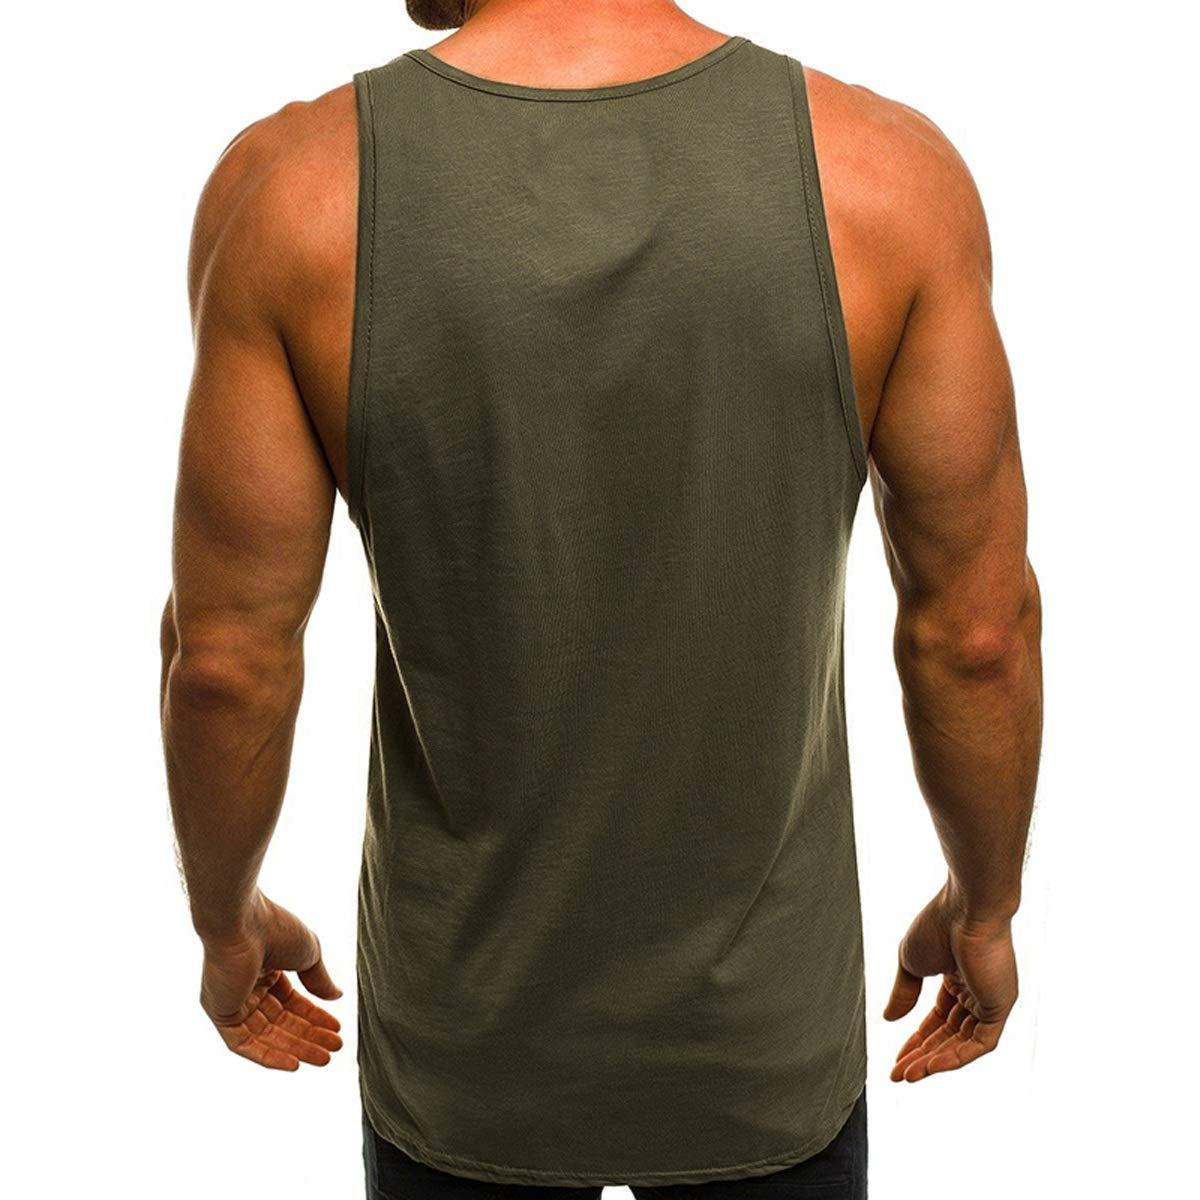 Otto Dobbin Summer New Mens Letter Printing Round Neck Slim Fitness Sports Casual Sleeveless Bottoming Vest